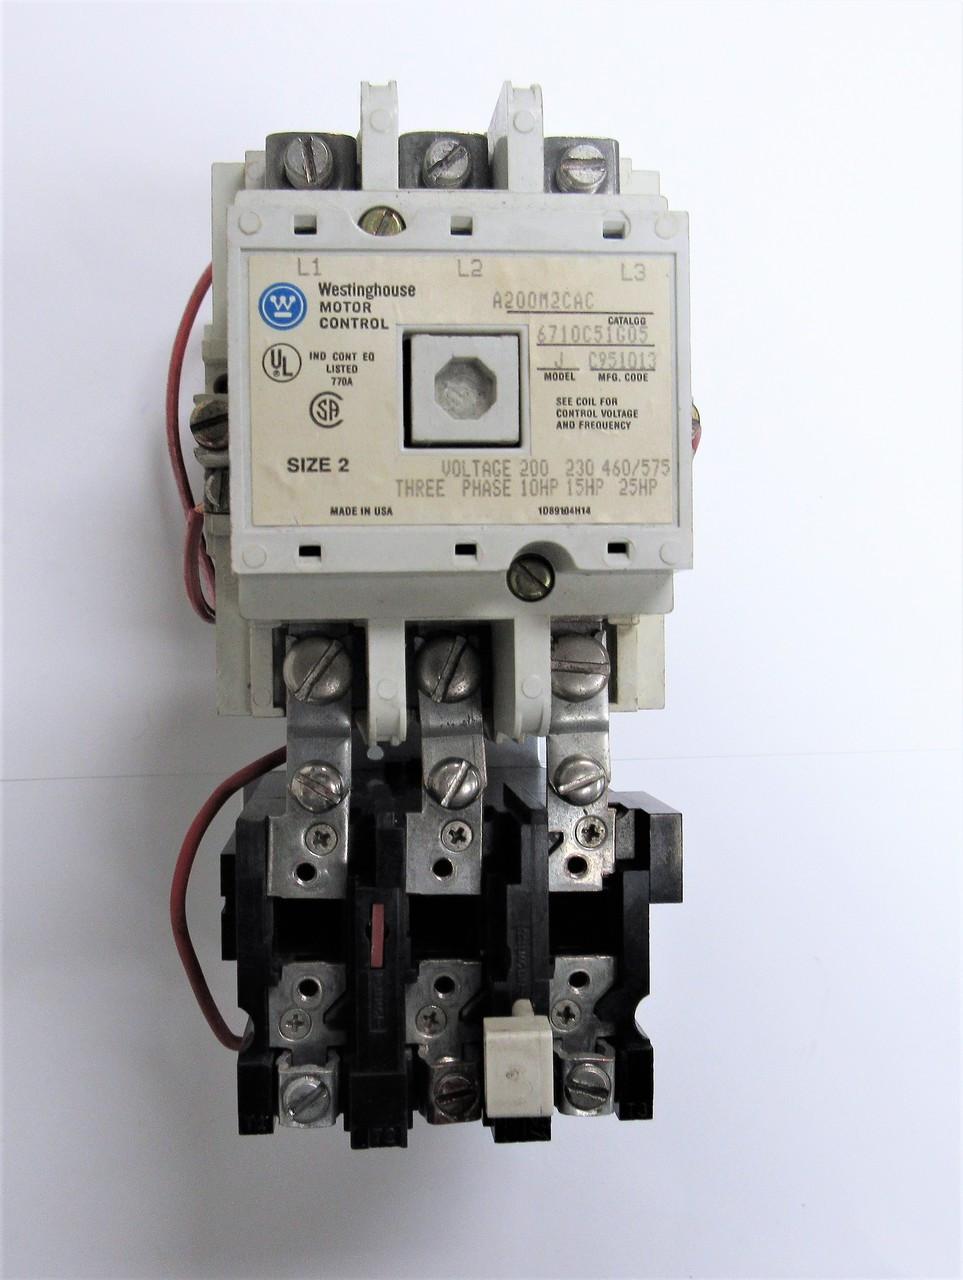 Westinghouse Motor Wiring 240 - Wiring Diagram G11 on